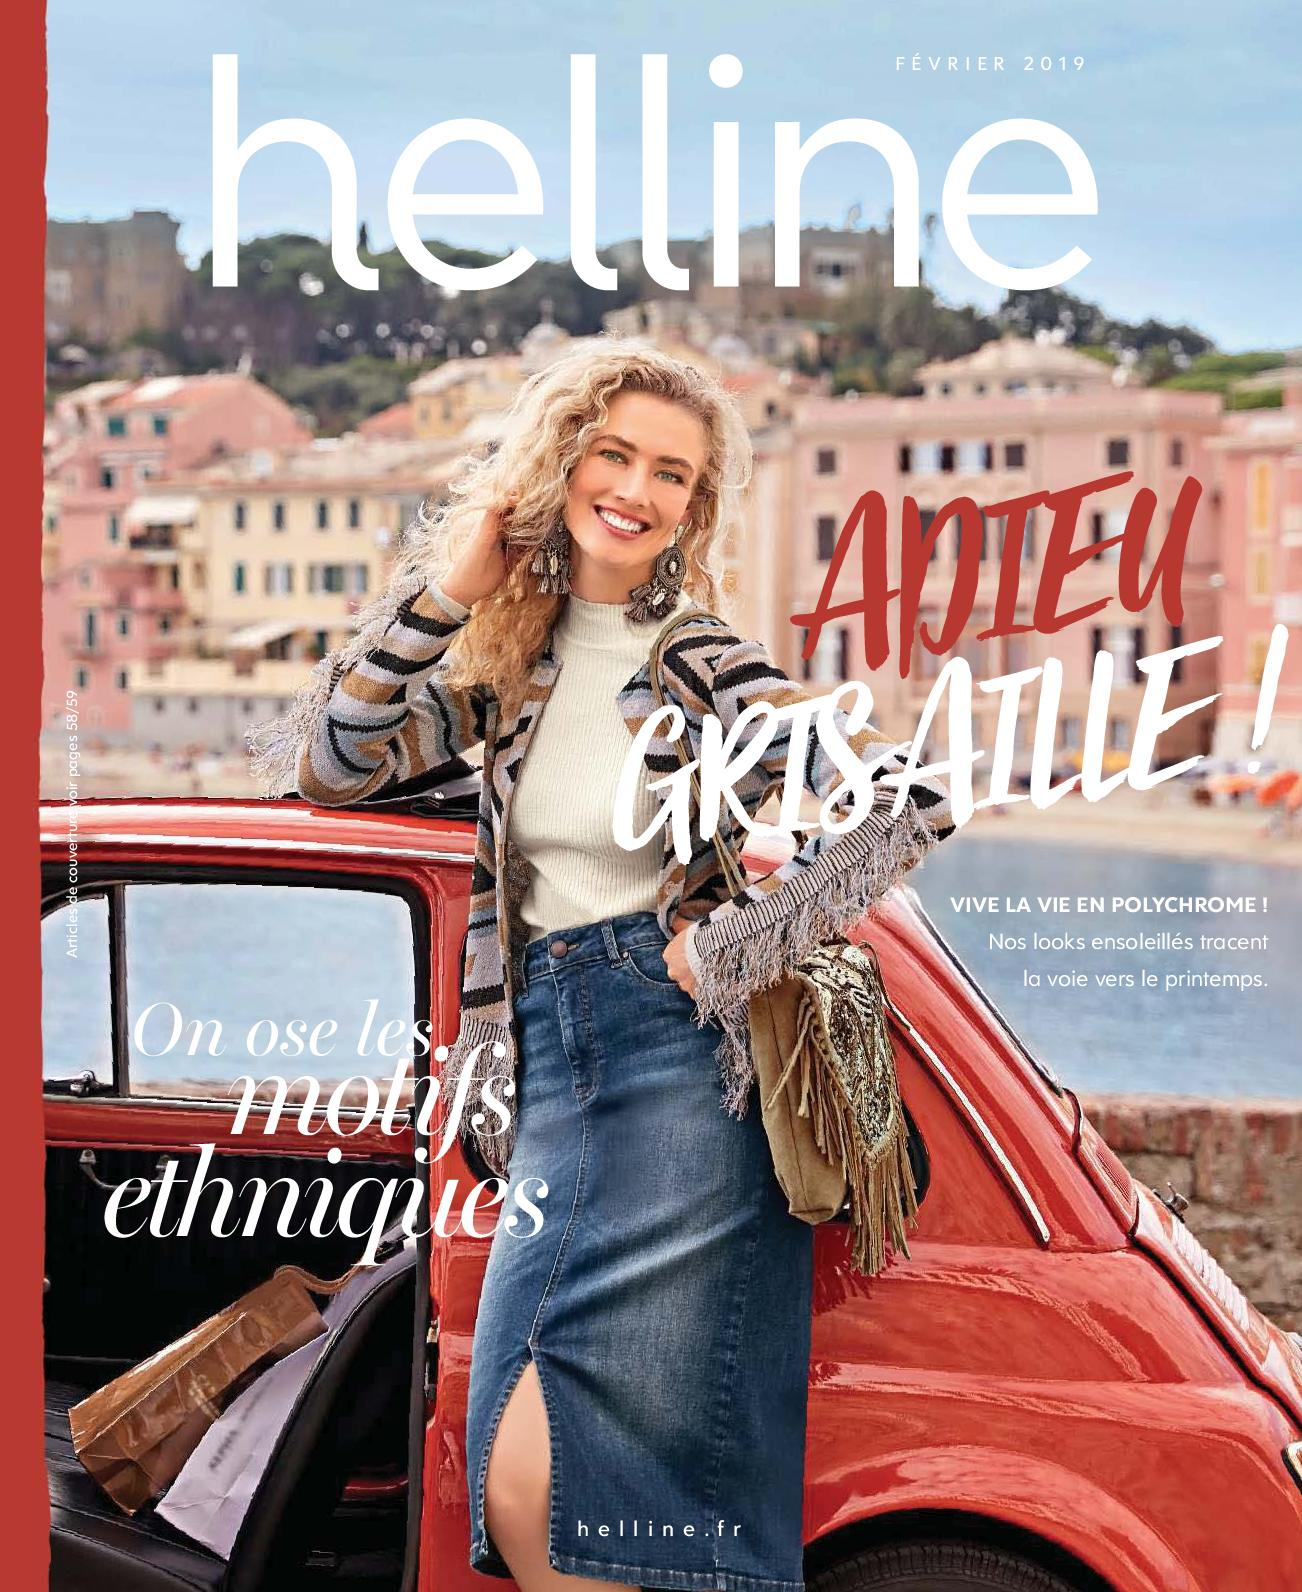 2019 Helline Catalogue Calaméo À Ete Printemps Consulter mN8wyvnO0